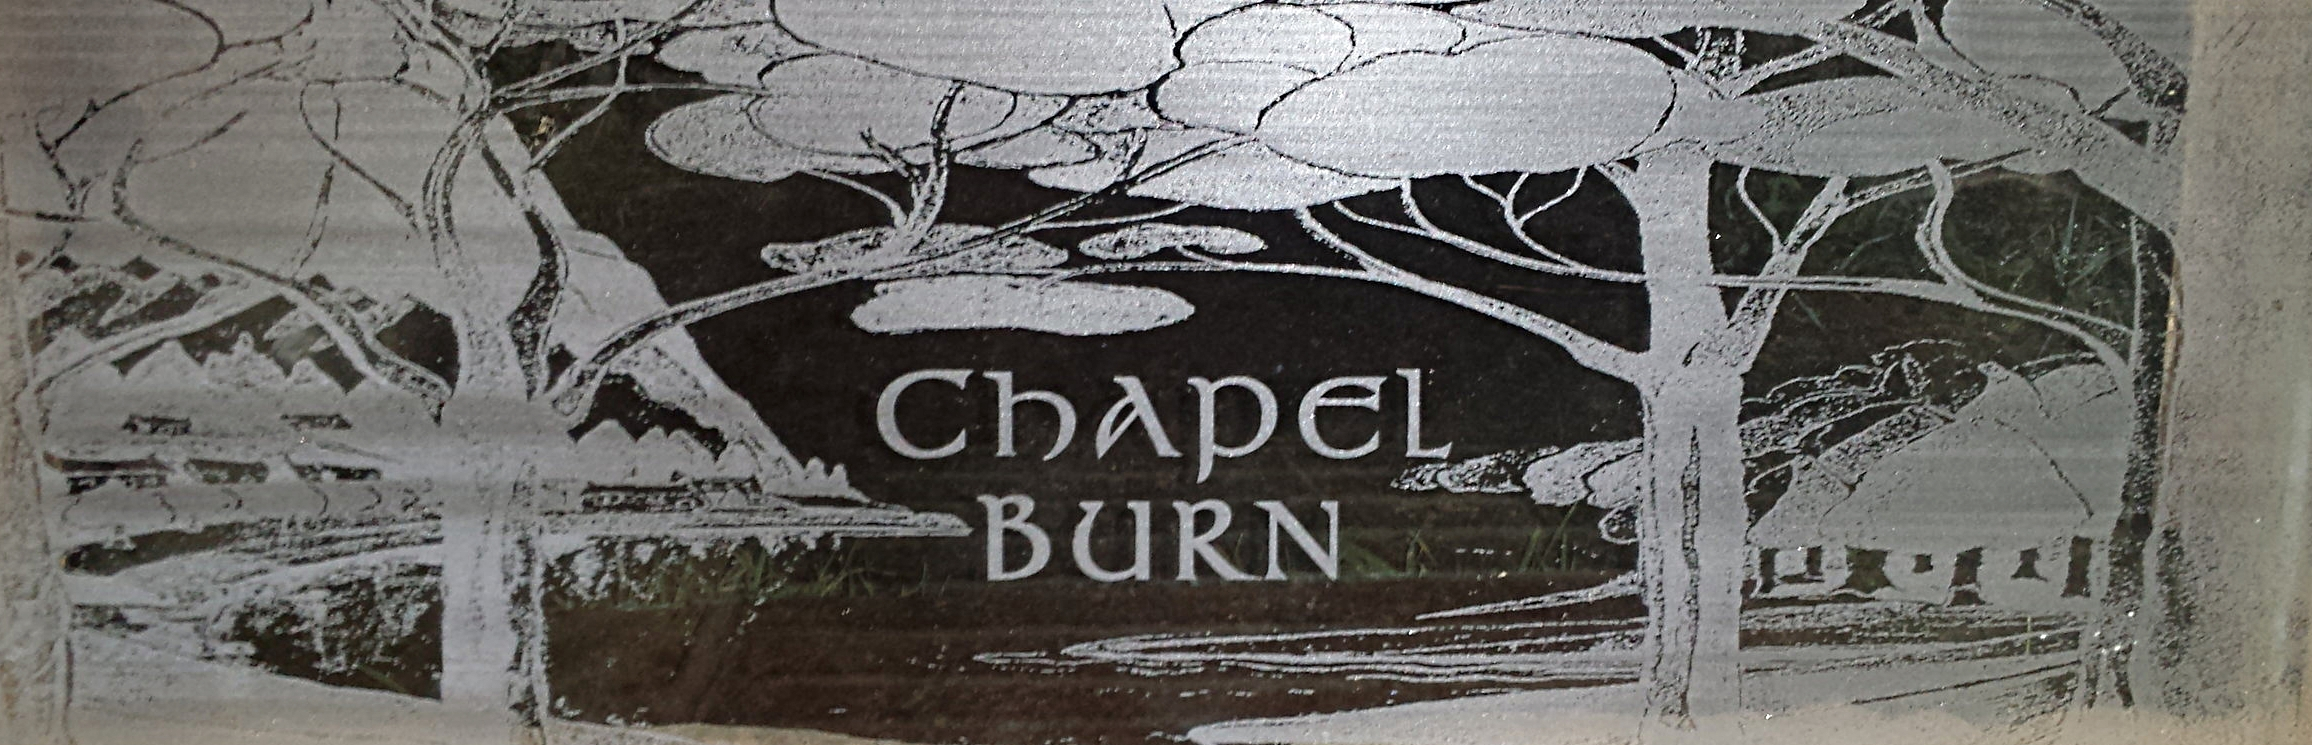 Chapel burn graphics.jpg